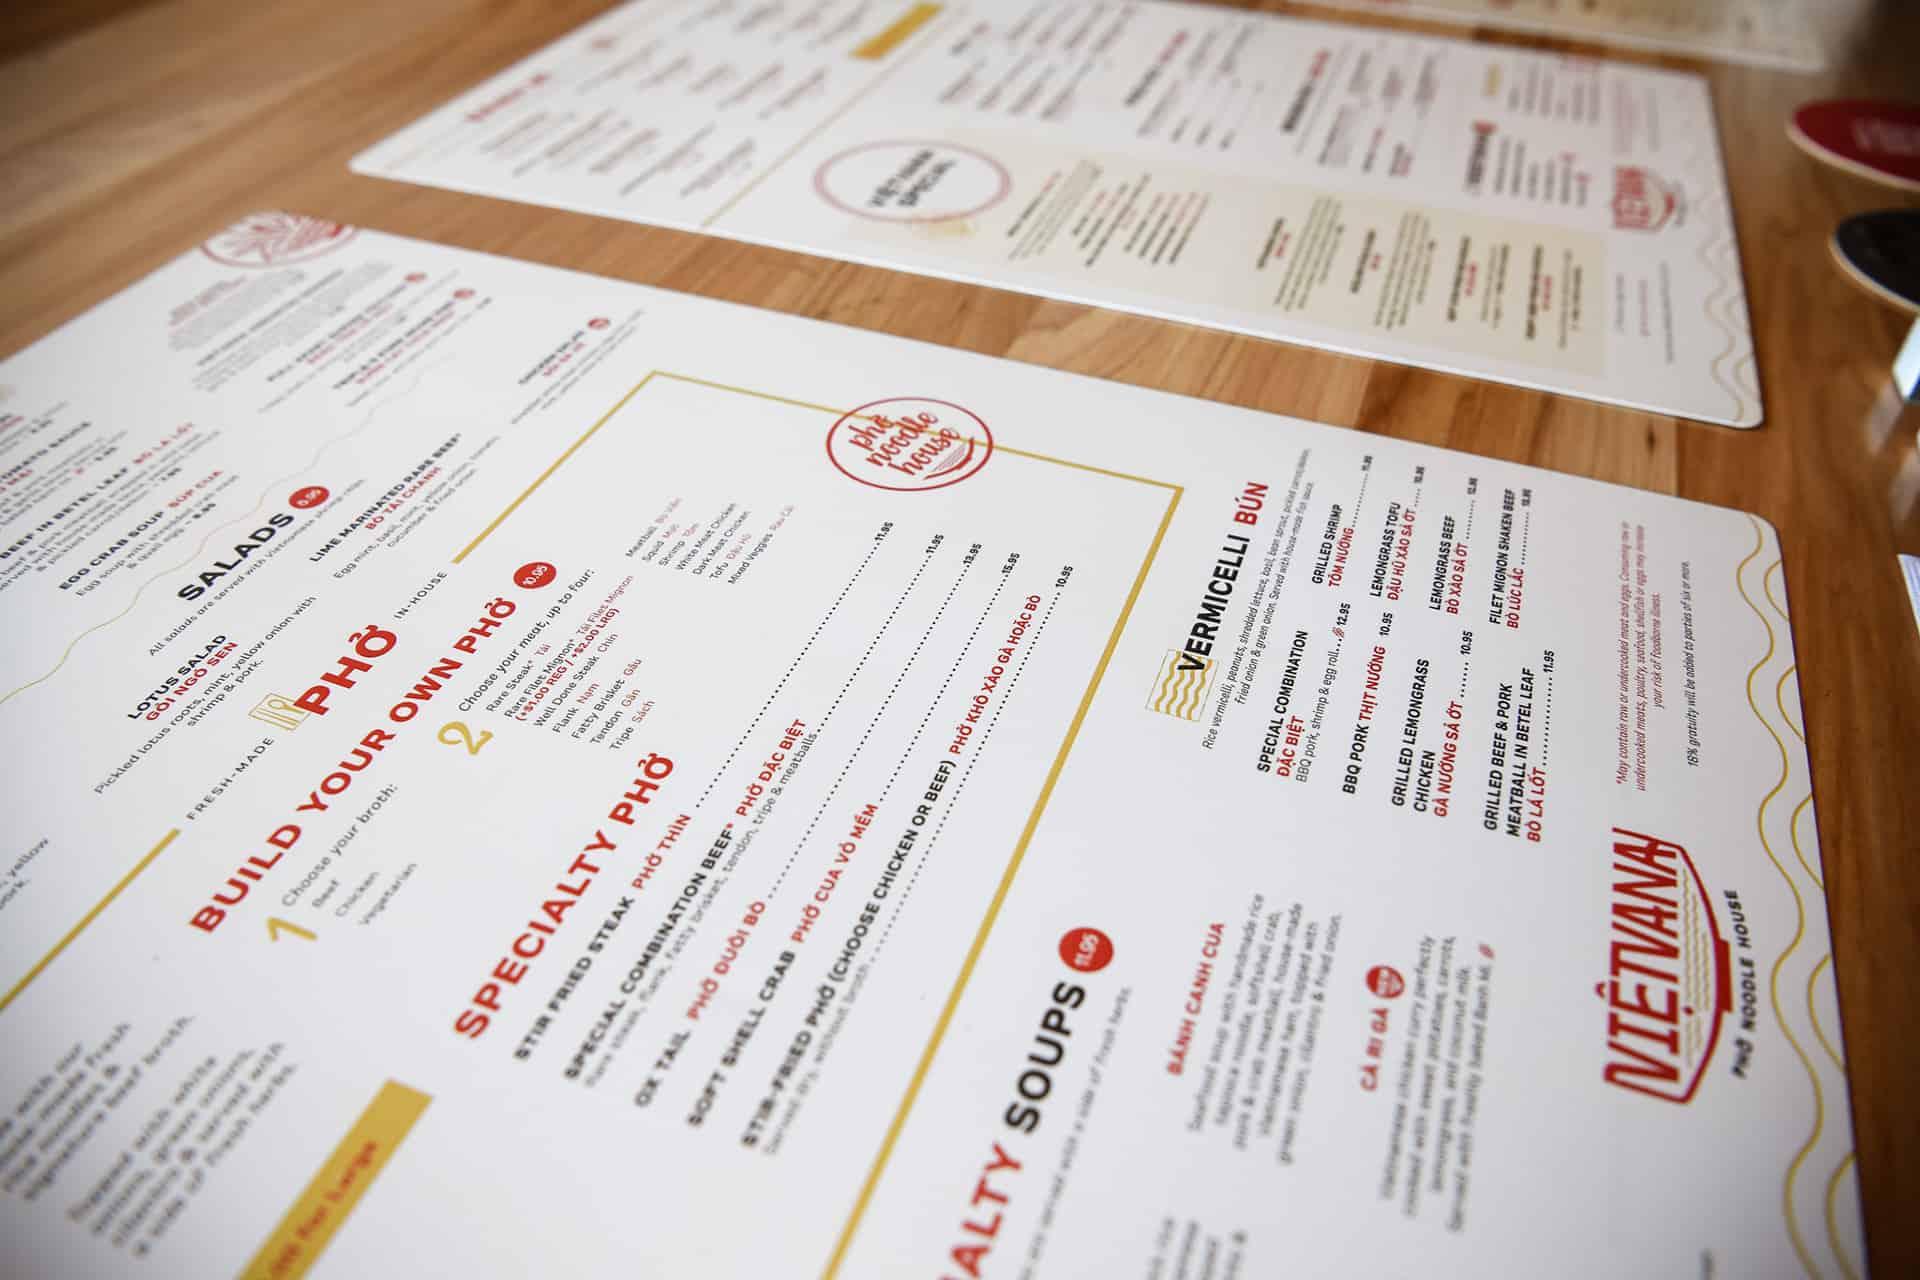 Vietvana - Vietnamese full service restaurant branding - menu systems design